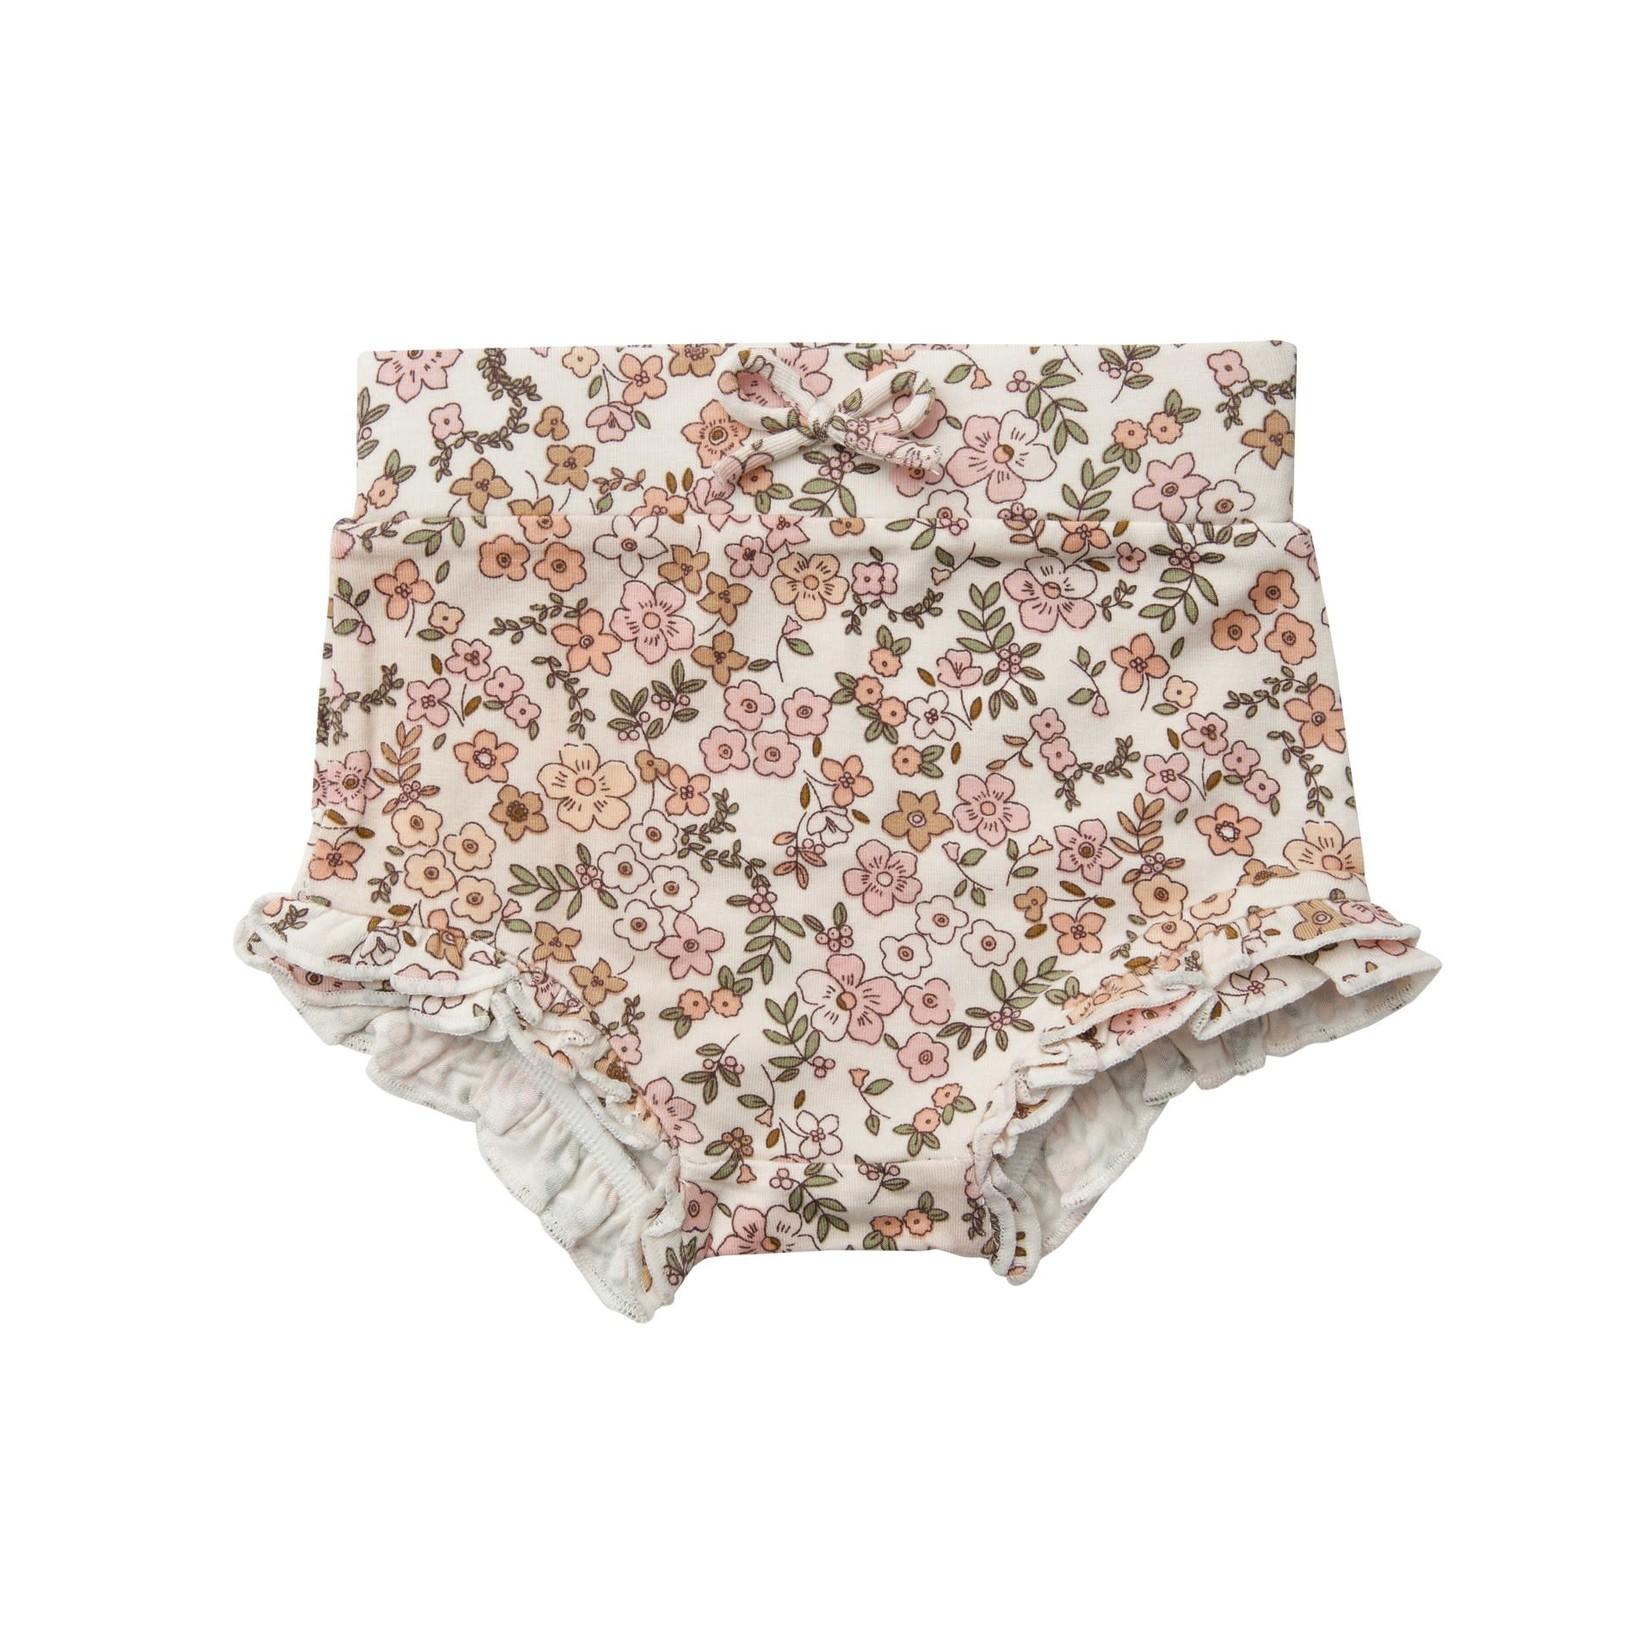 Angel Dear High Waist Shorts, Vintage Calico